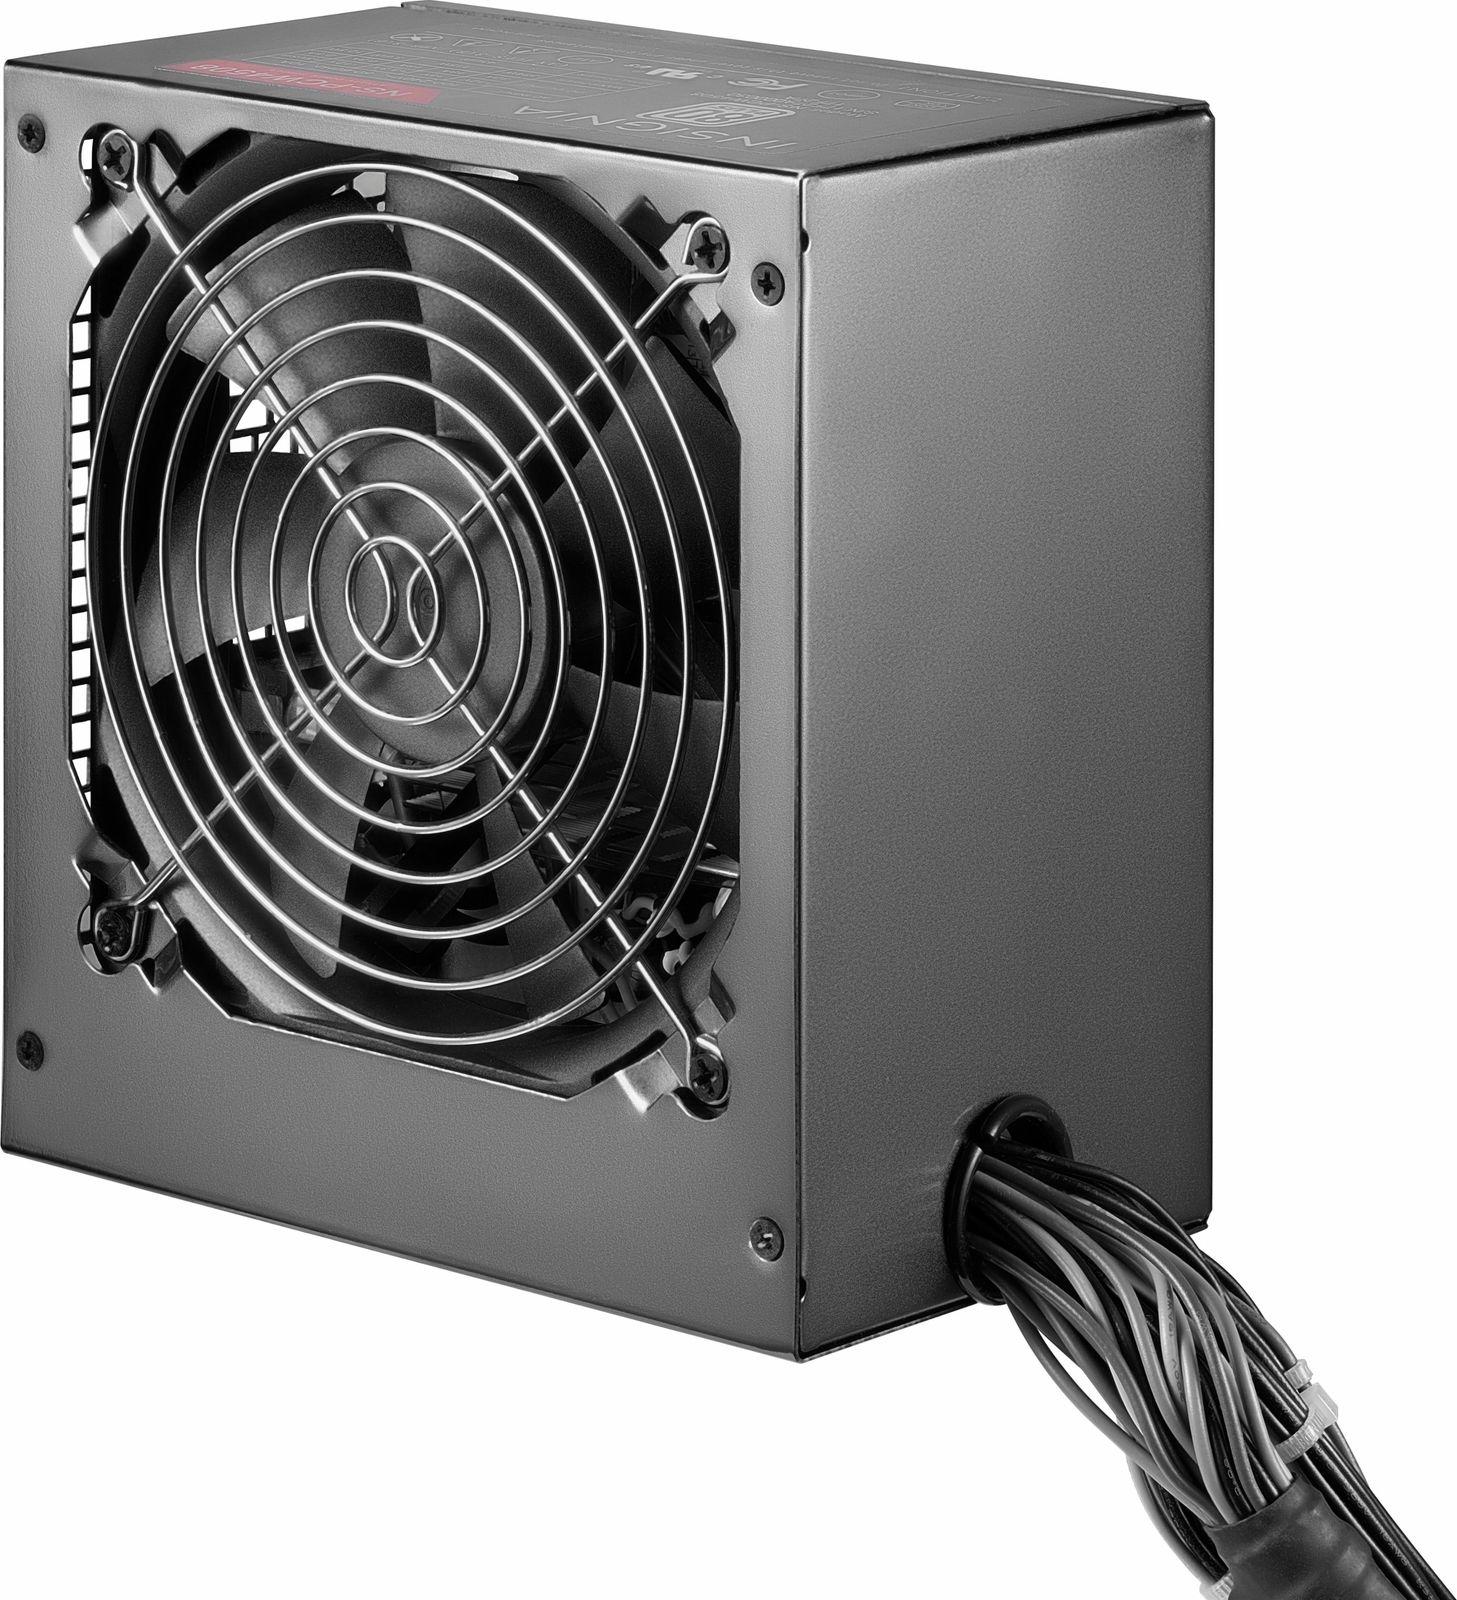 Insignia 450W ATX12V 2.4/EPS12V 2.92 80 Plus Power Supply